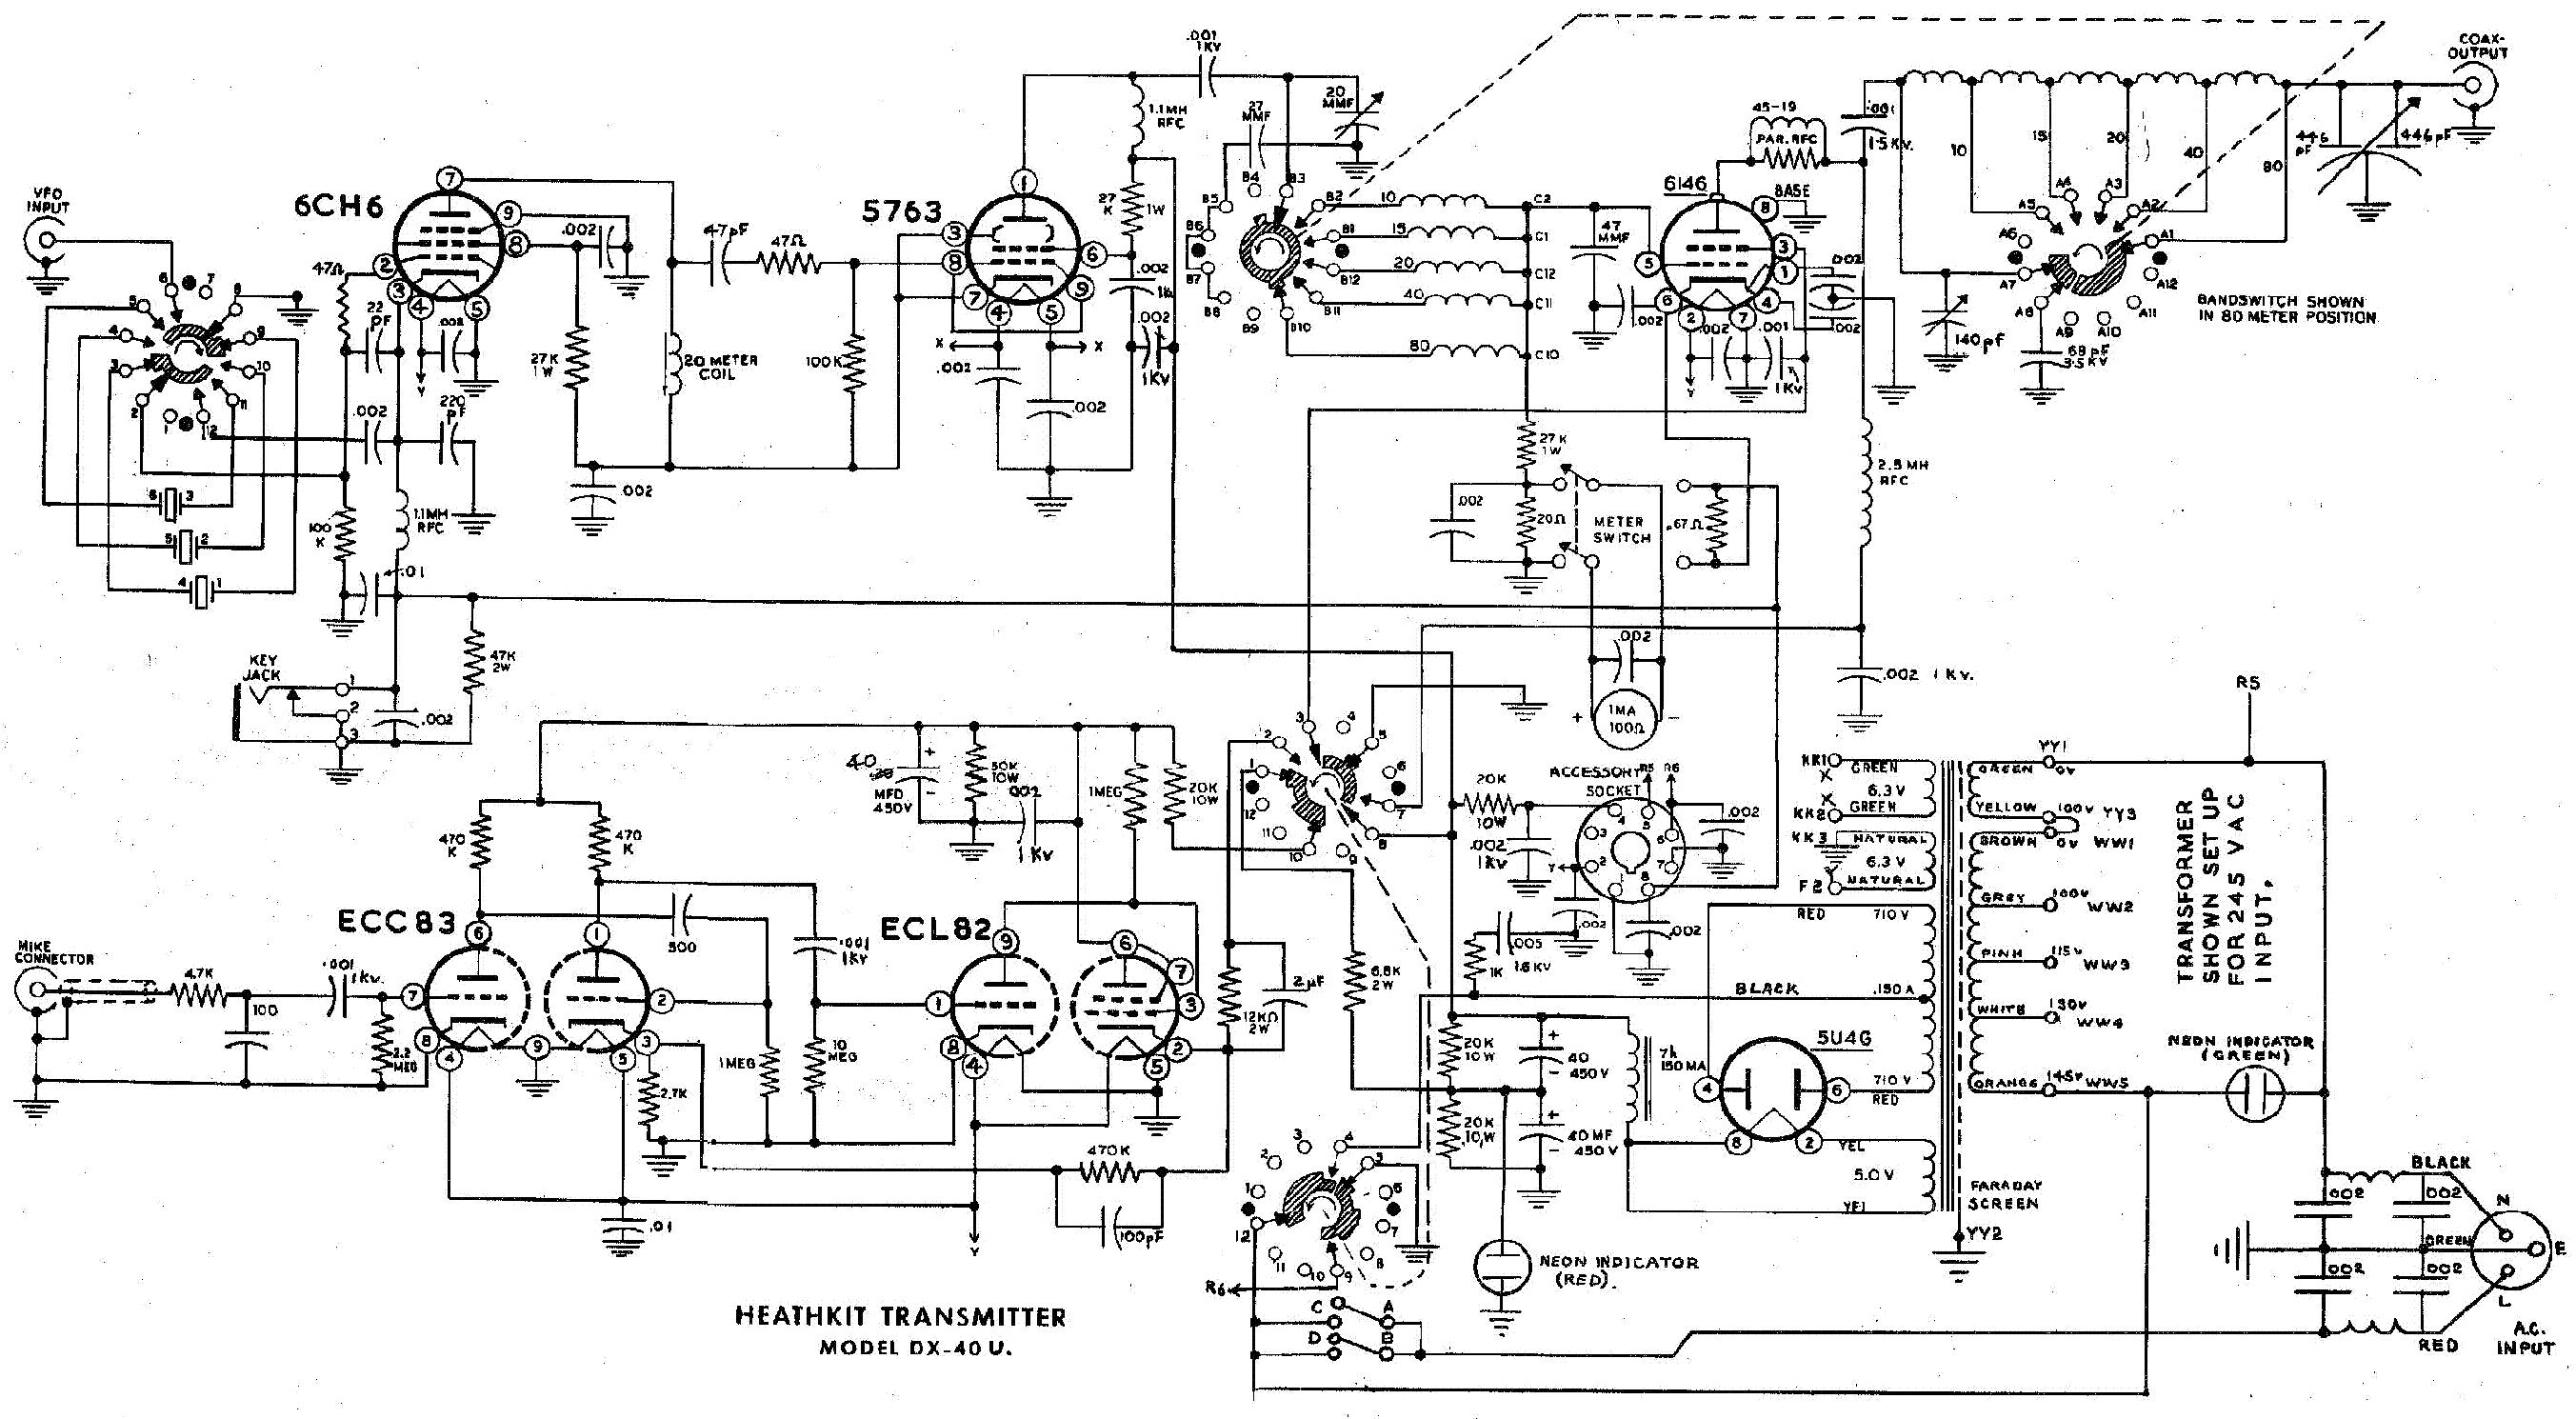 HEATHKIT DX-40-U TRANSMITTER SM service manual (1st page)